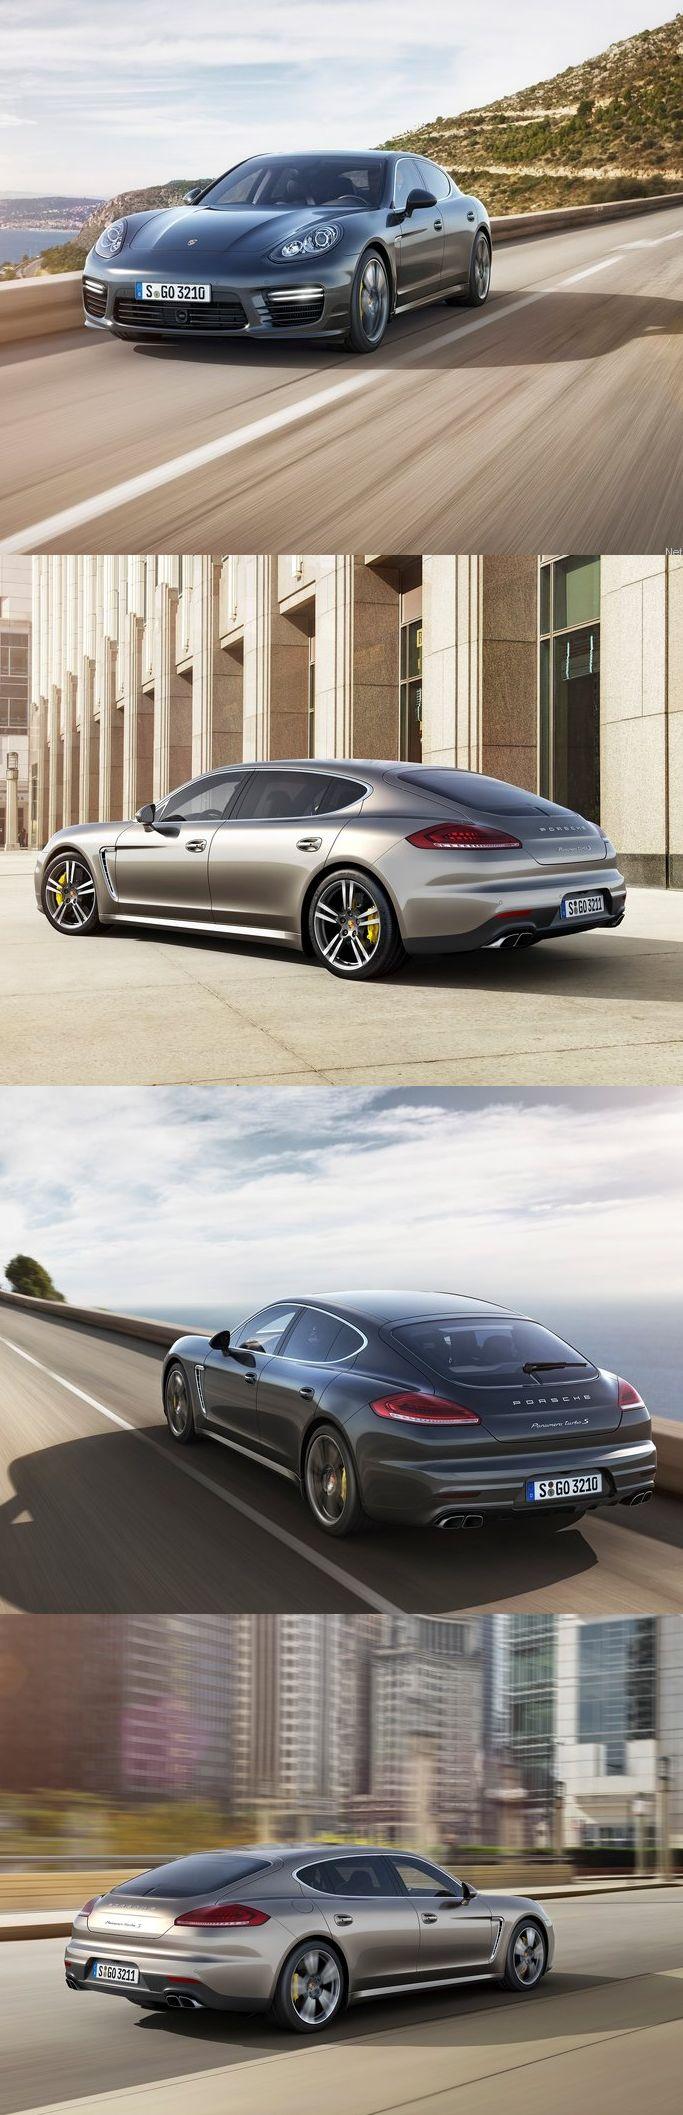 Porsche revela Panamera Turbo S http://revista.webmotors.com.br/lancamentos/porsche-revela-panamera-turbo-s/1333467336000?utm_source=pinterest&utm_medium=social&utm_campaign=post&utm_term=revista&utm_content=porsche%20turbo